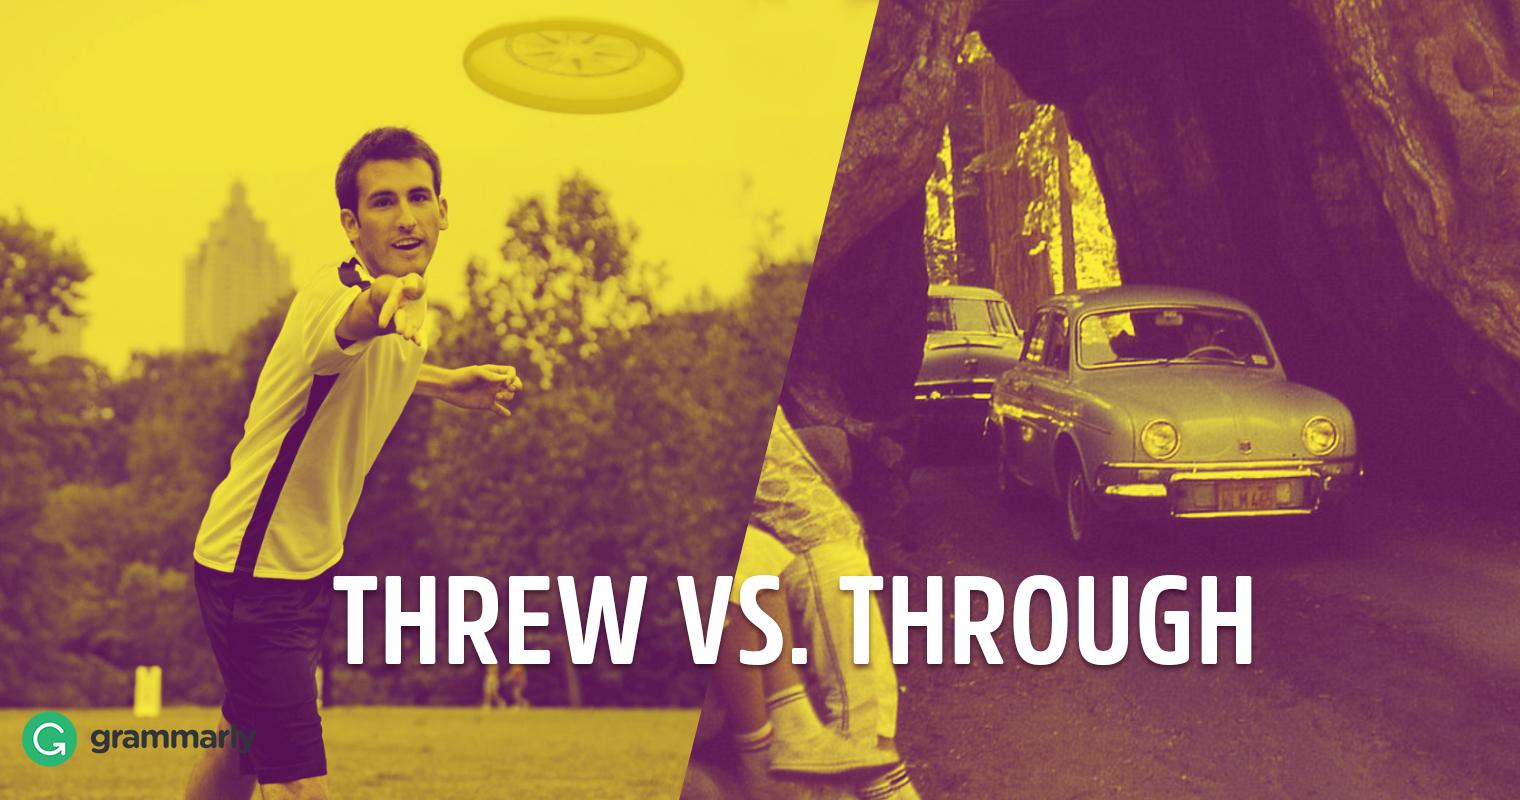 Threw vs. Through image